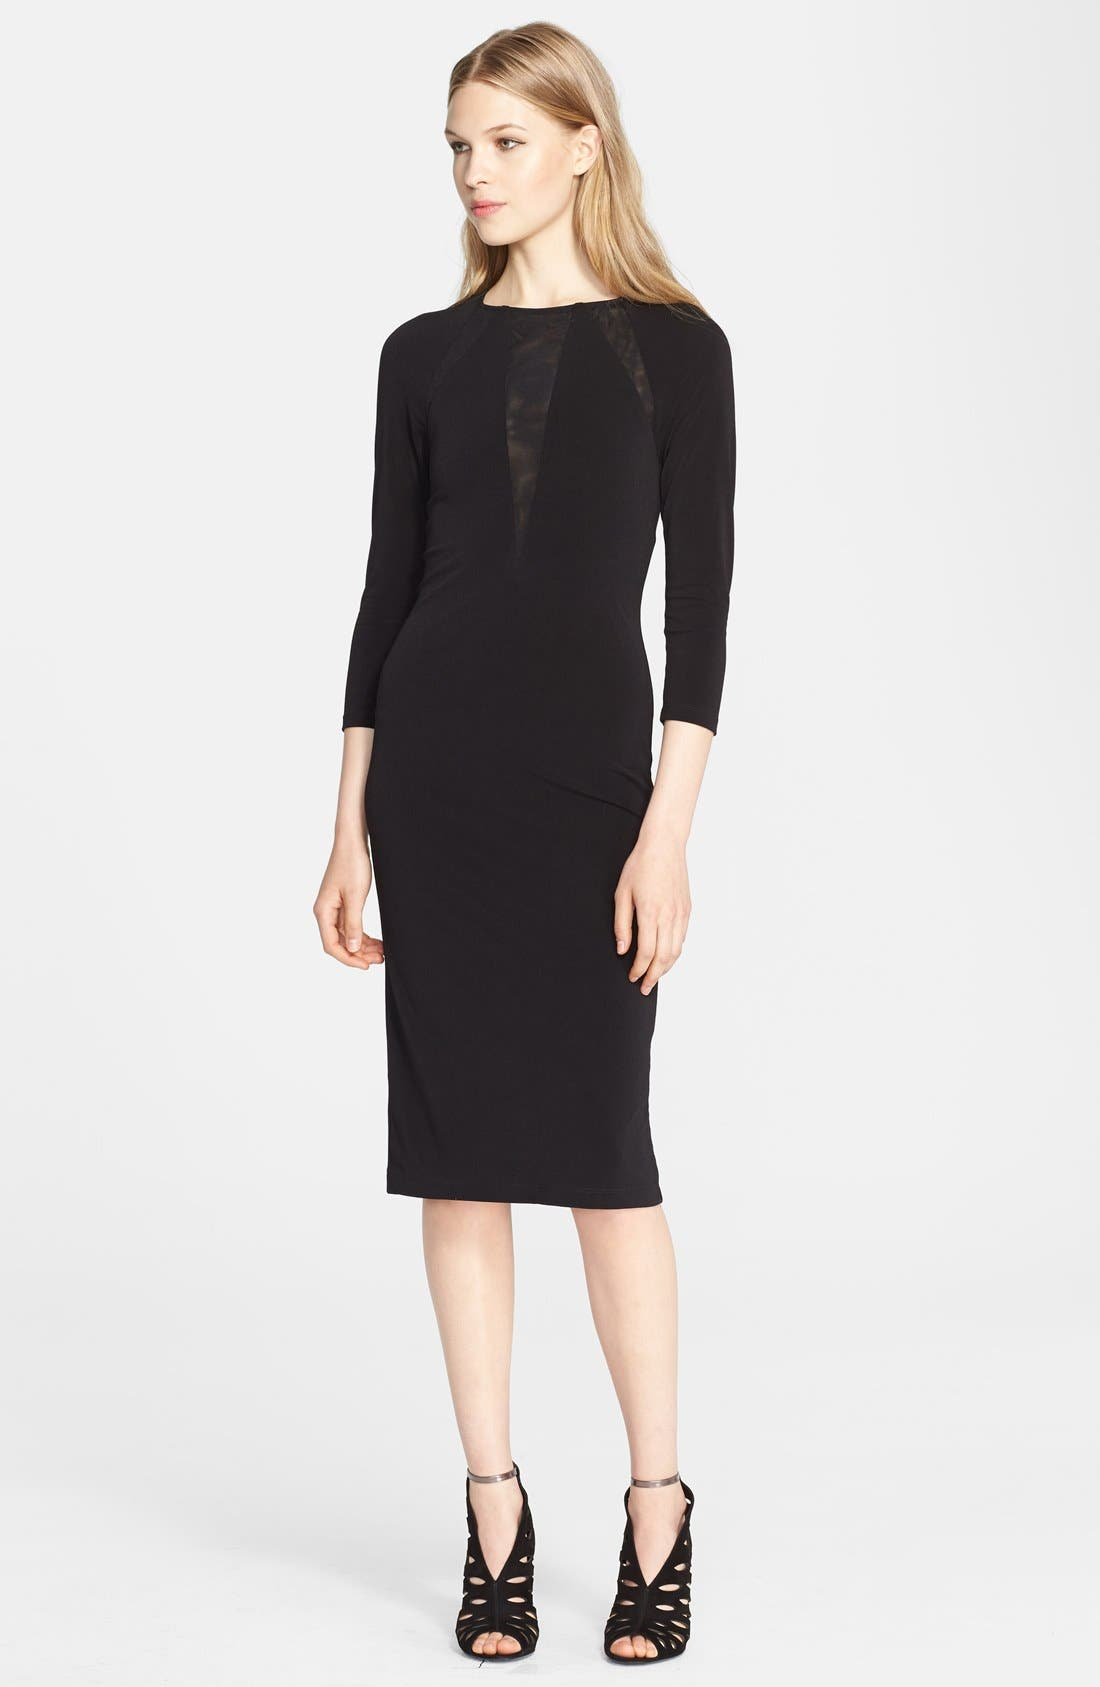 Alternate Image 1 Selected - Alice + Olivia 'Maris' Sheer Sunburst Jersey Dress